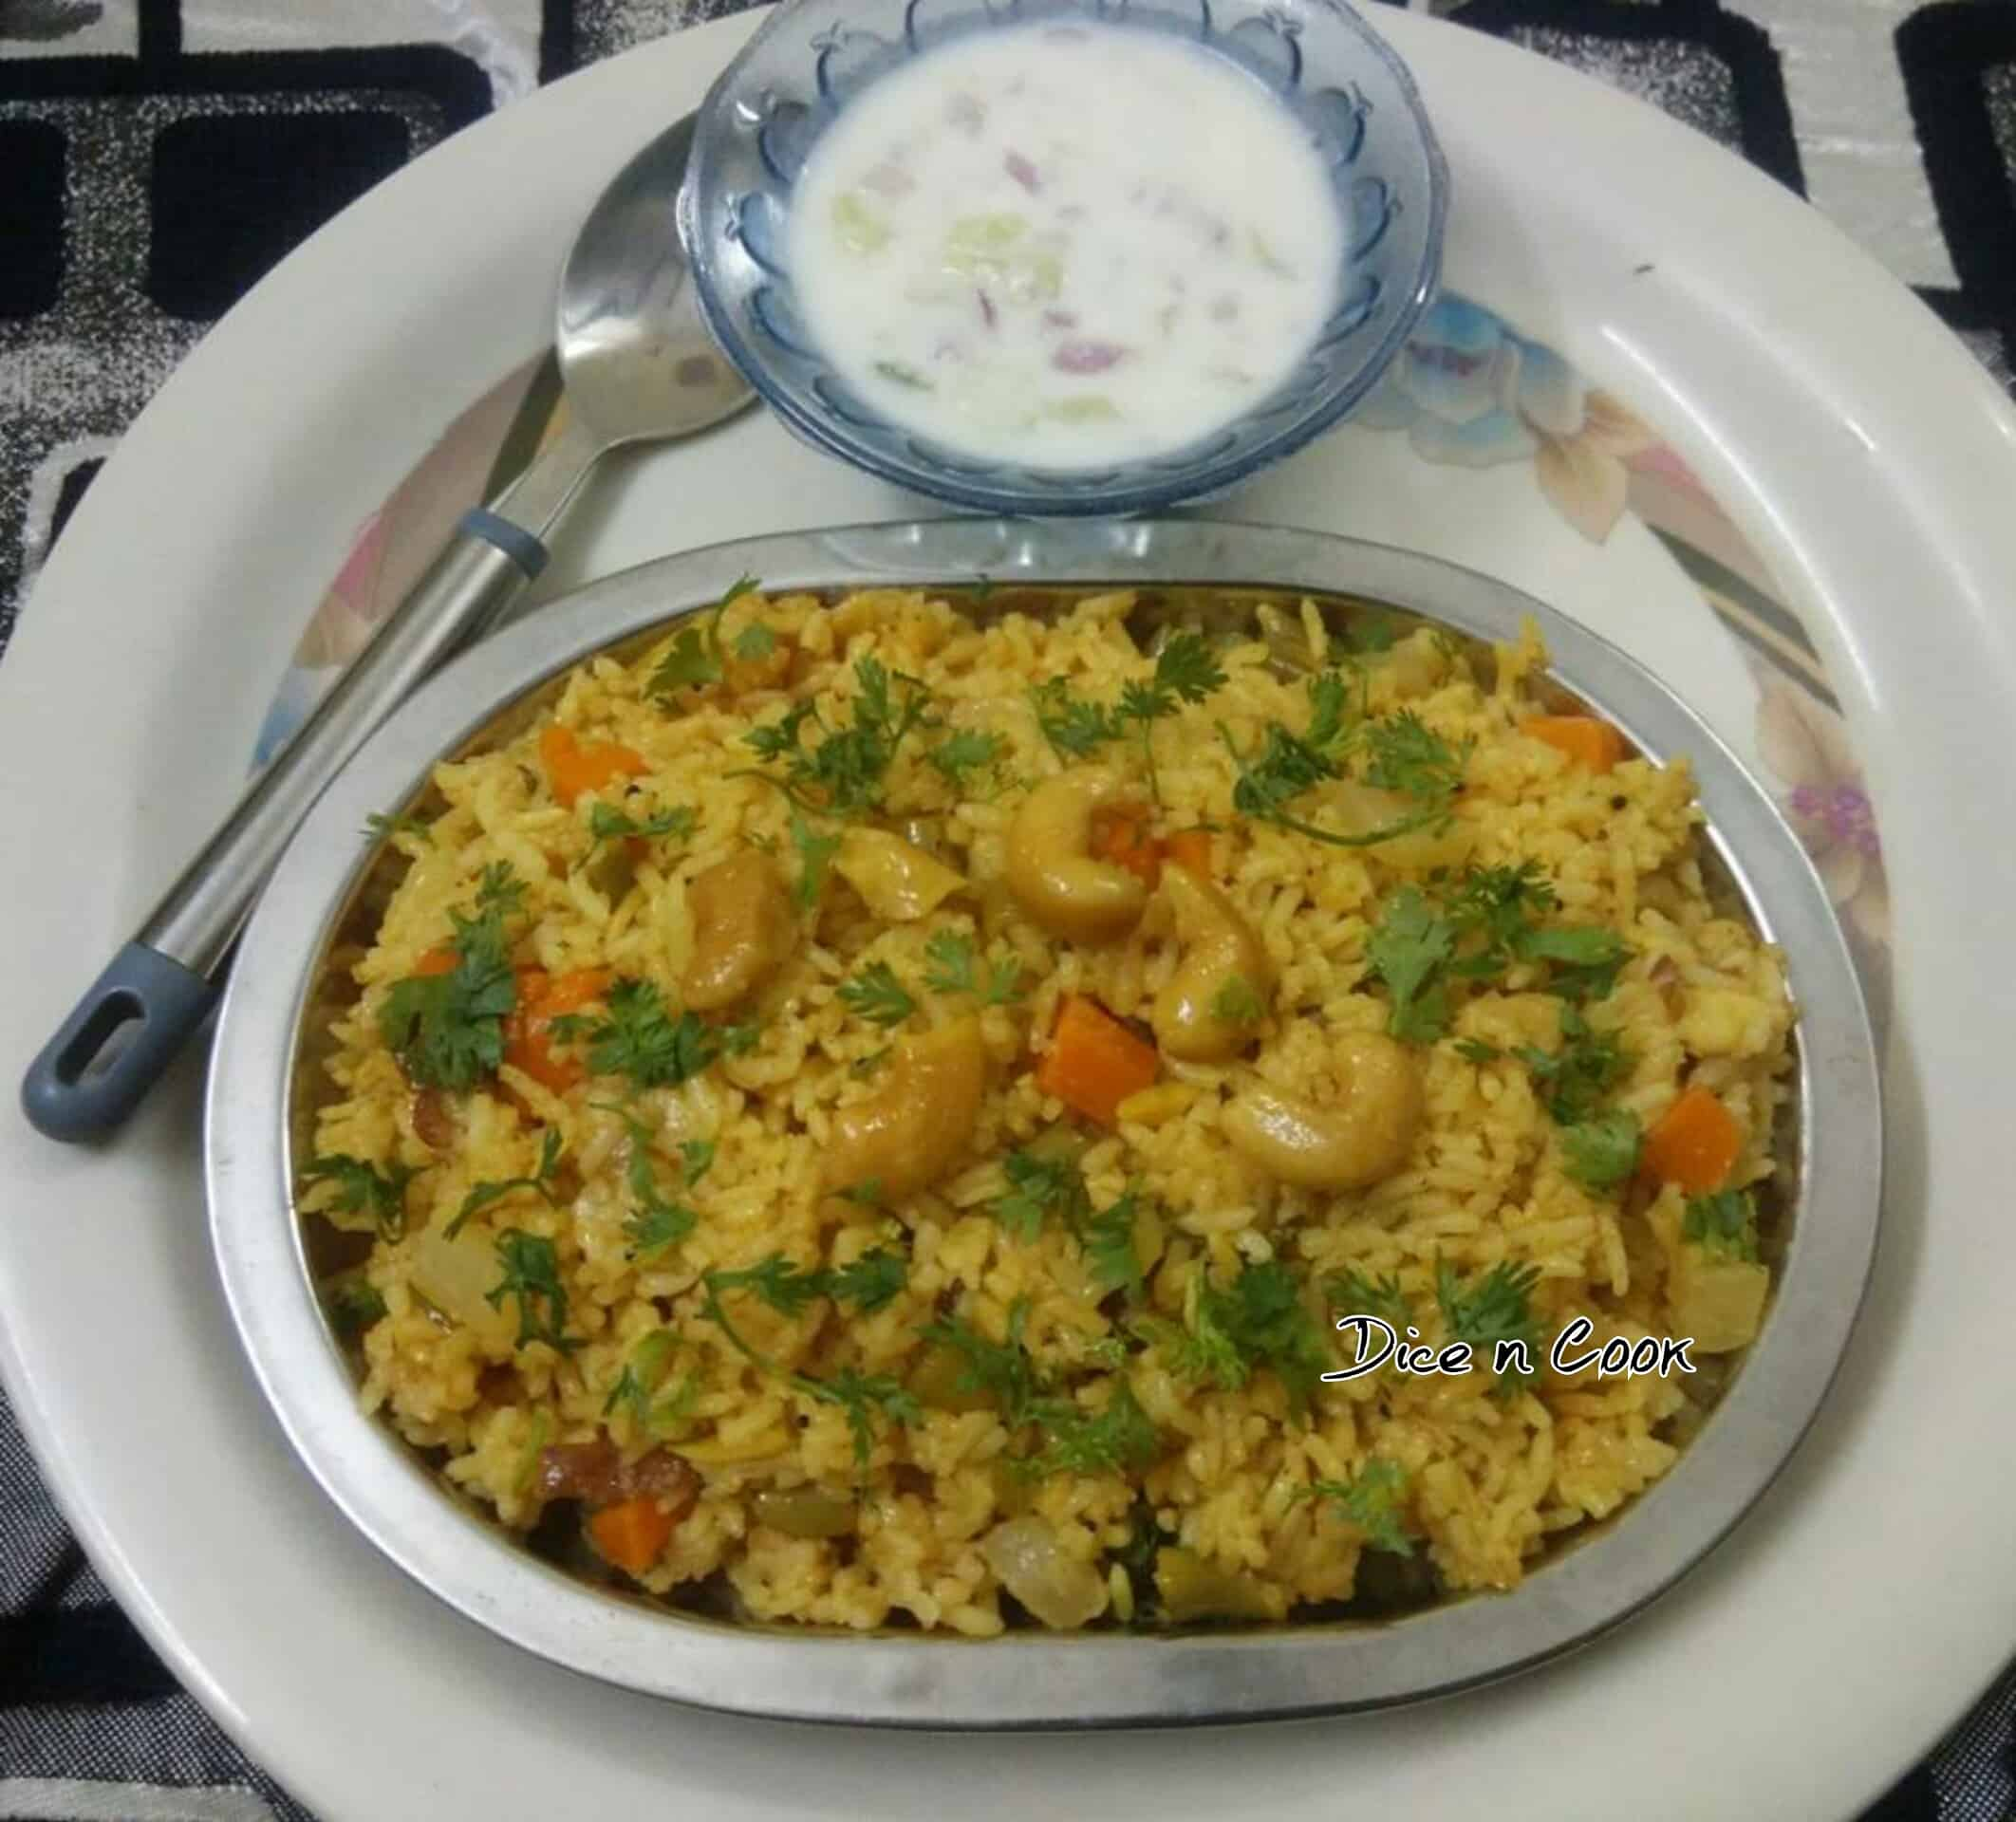 Allahabad ki Tehri or Allahabad Rice